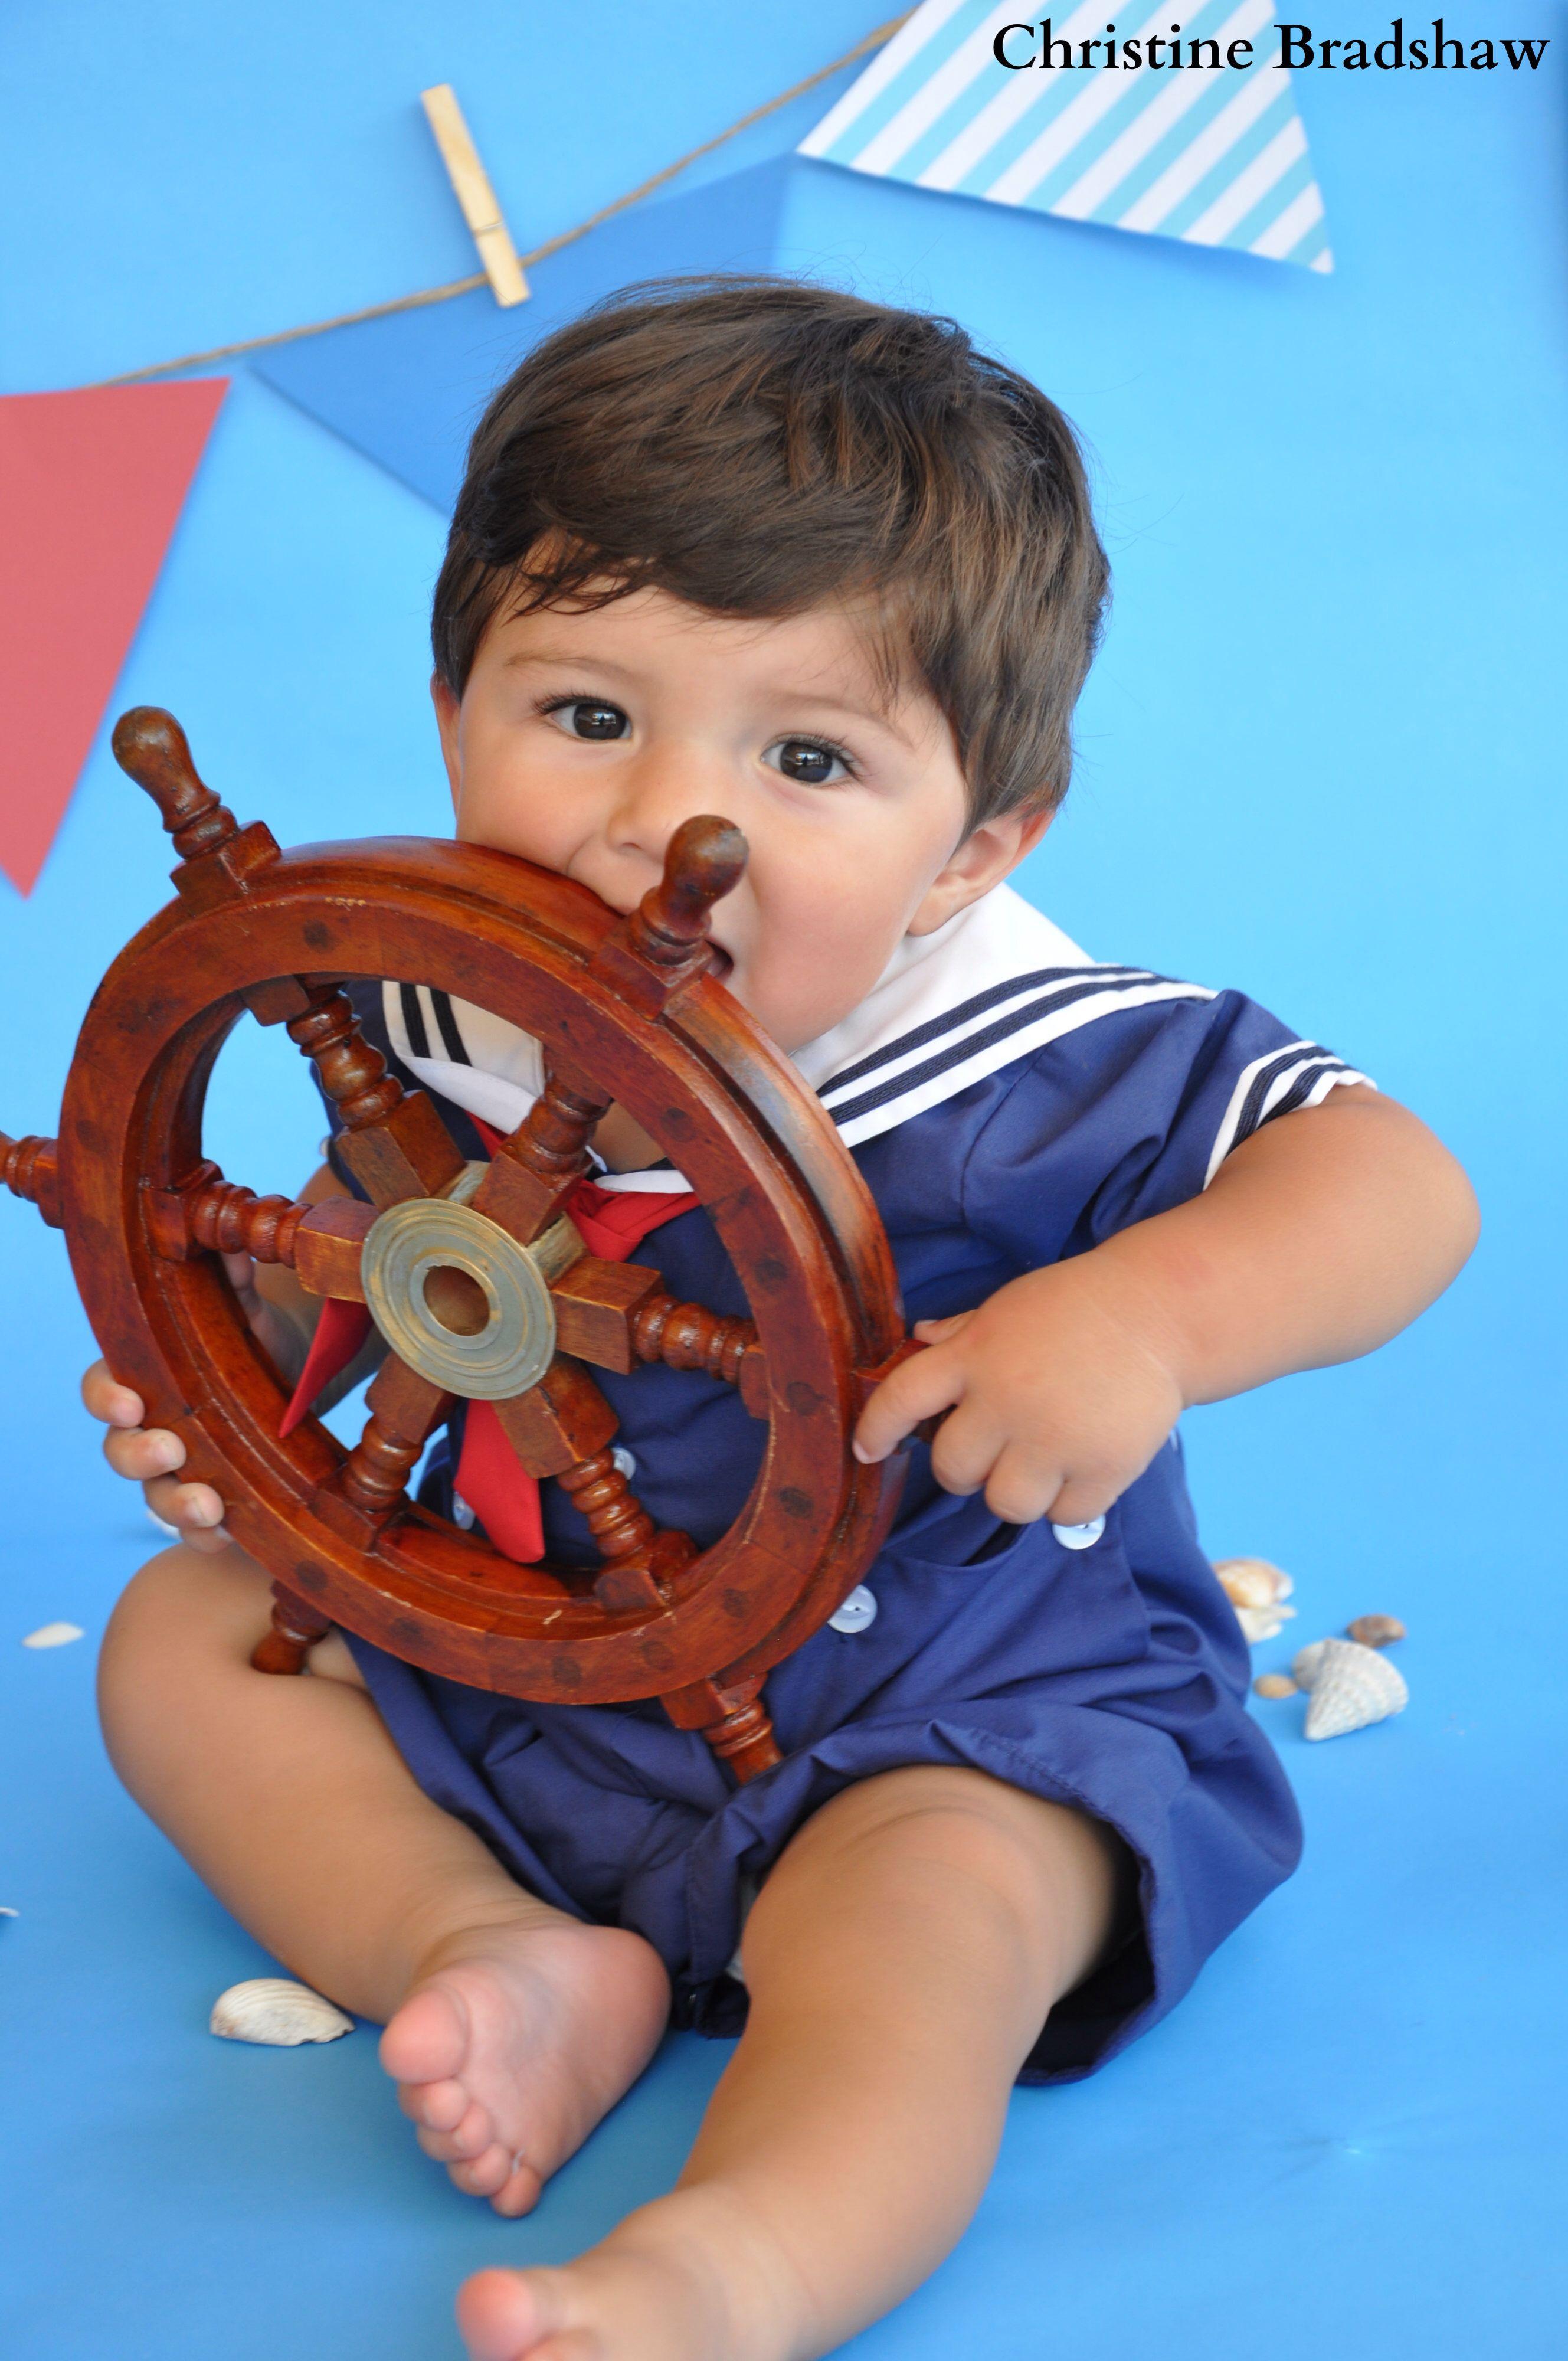 Sailor themed baby photoshoot | Baby photoshoot, Sailor ...